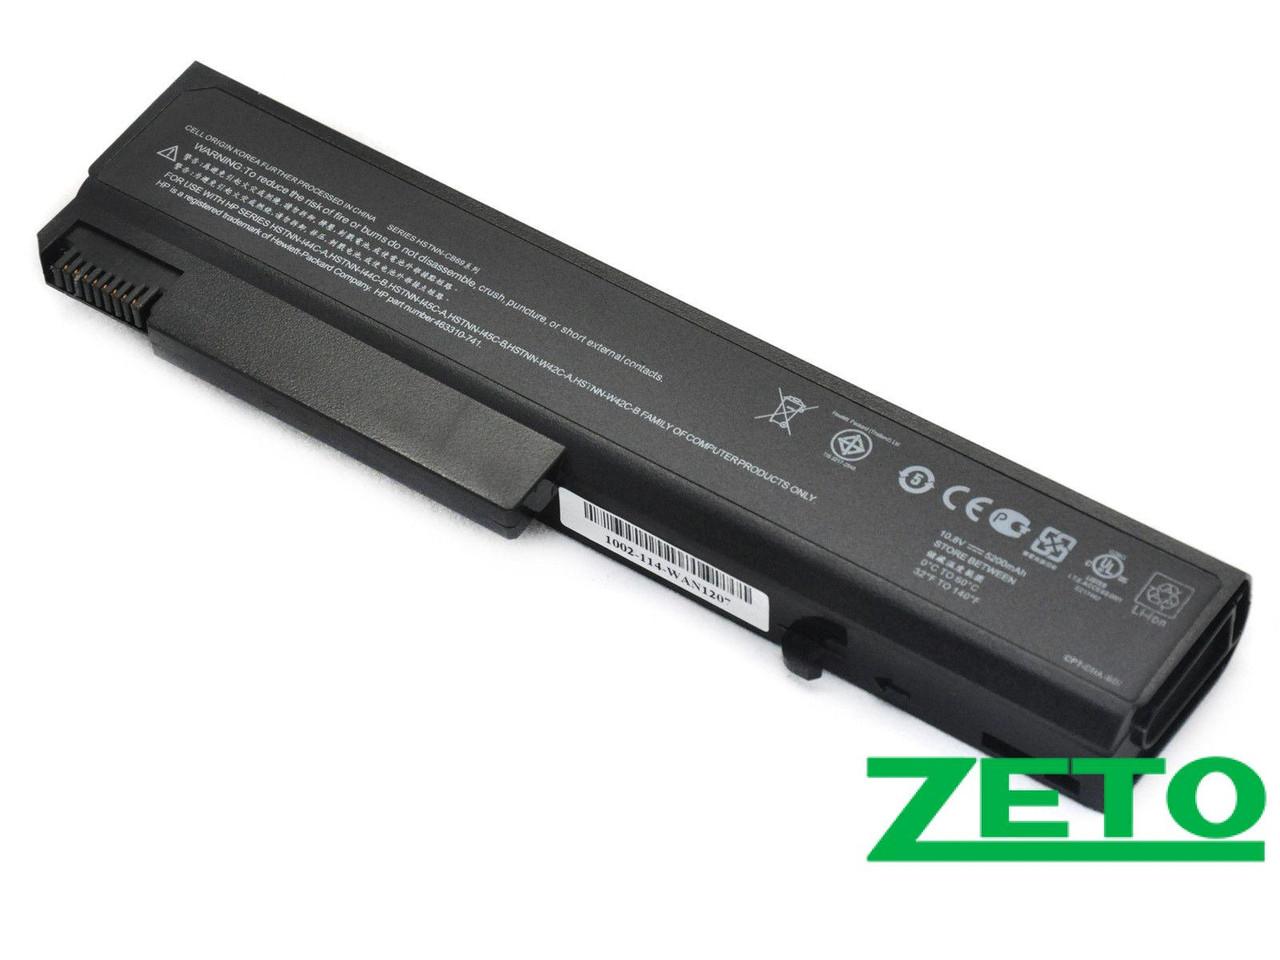 Батарея (аккумулятор) HP COMPAQ 6735b (11.1V 5200mAh)